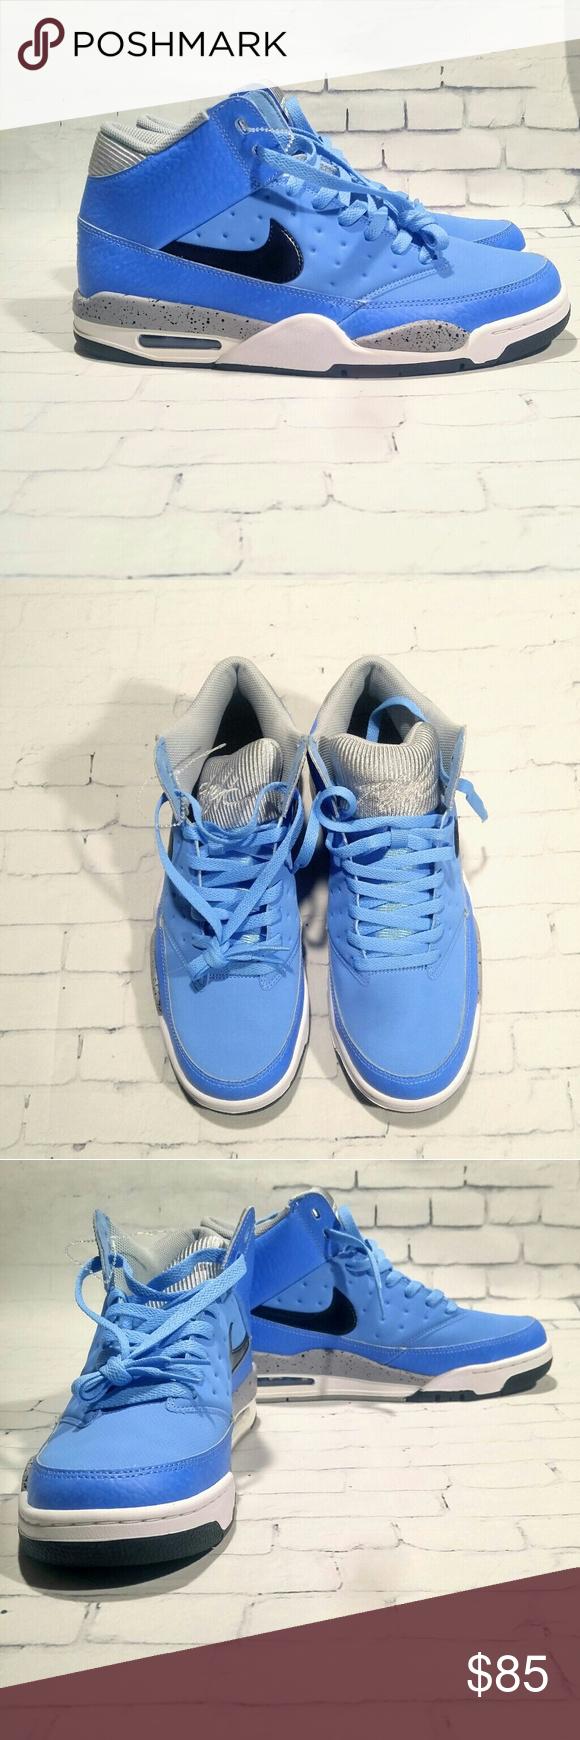 20553b277854 New Nike Air Flight Classic University Blue sz 11 You are buying New Nike  Flight Air